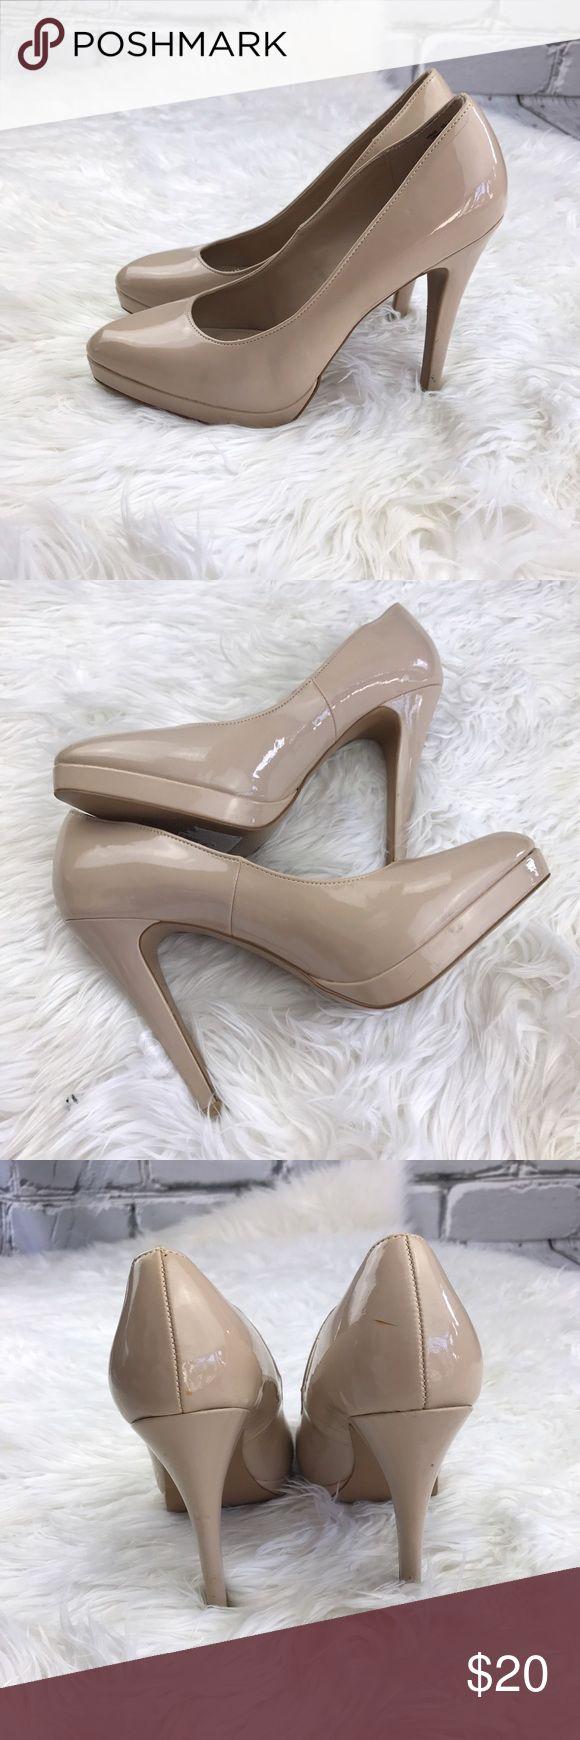 "SALE ELLE Taupe Patten 5"" Heels Fantastic  ELLE Taupe 5"" Patten Heels Elle Shoes Heels"